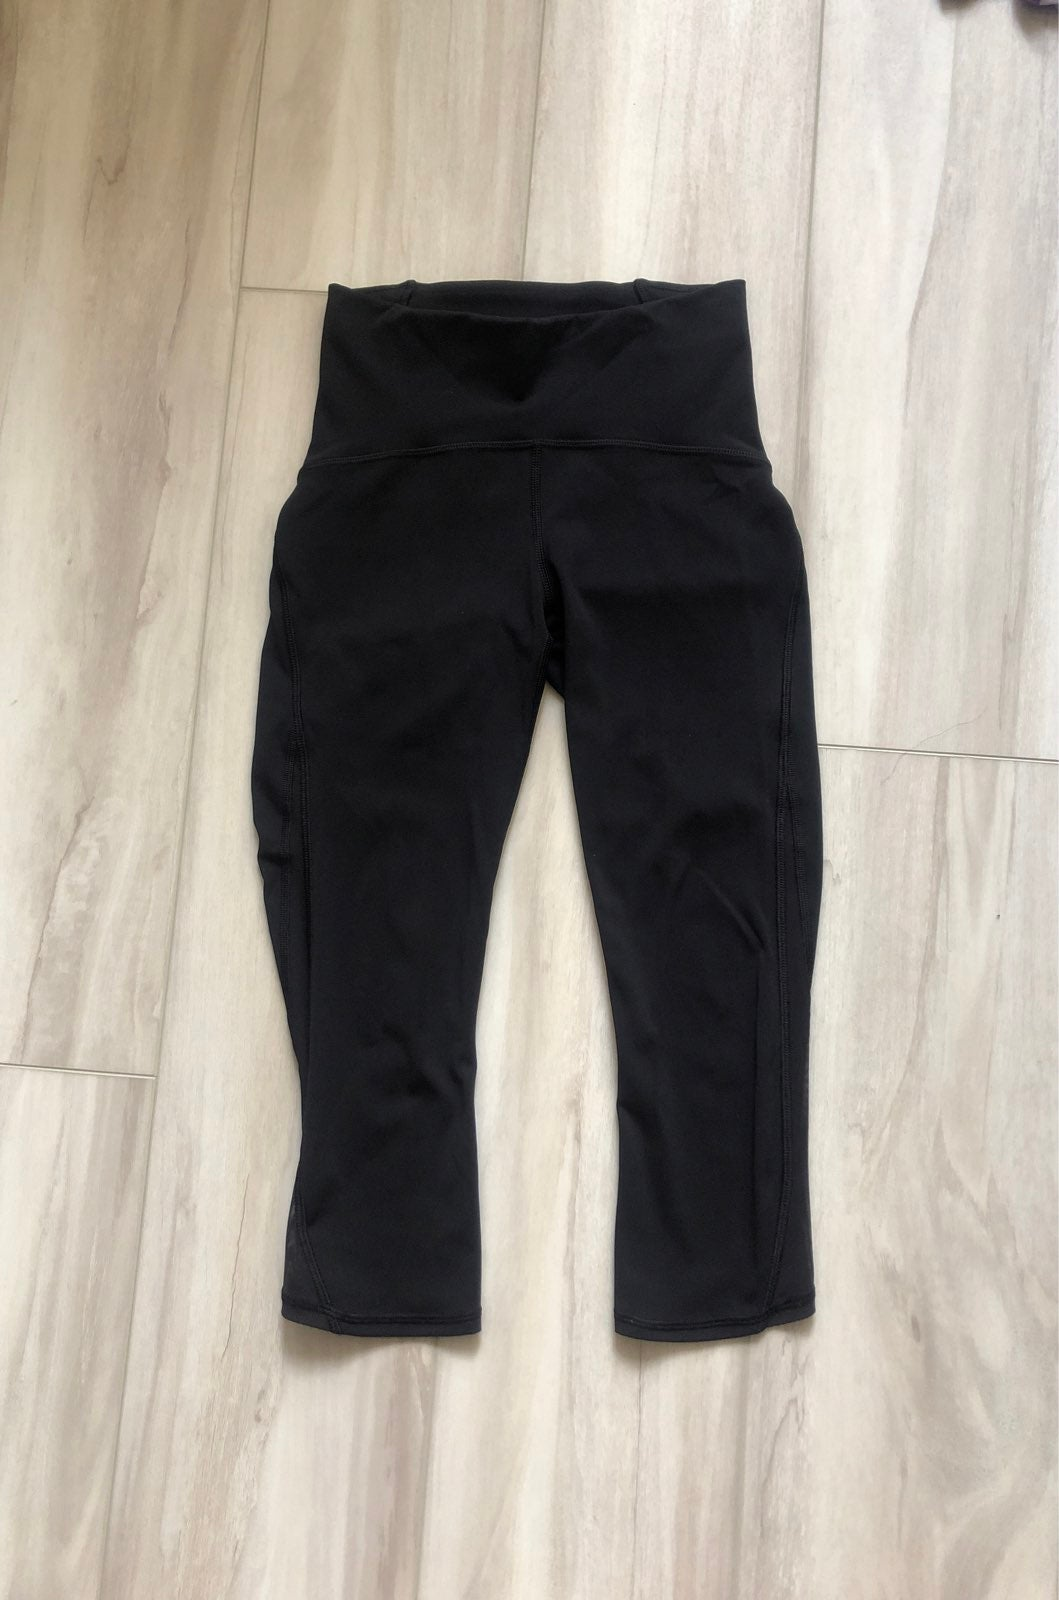 Lululemon black legging size 2